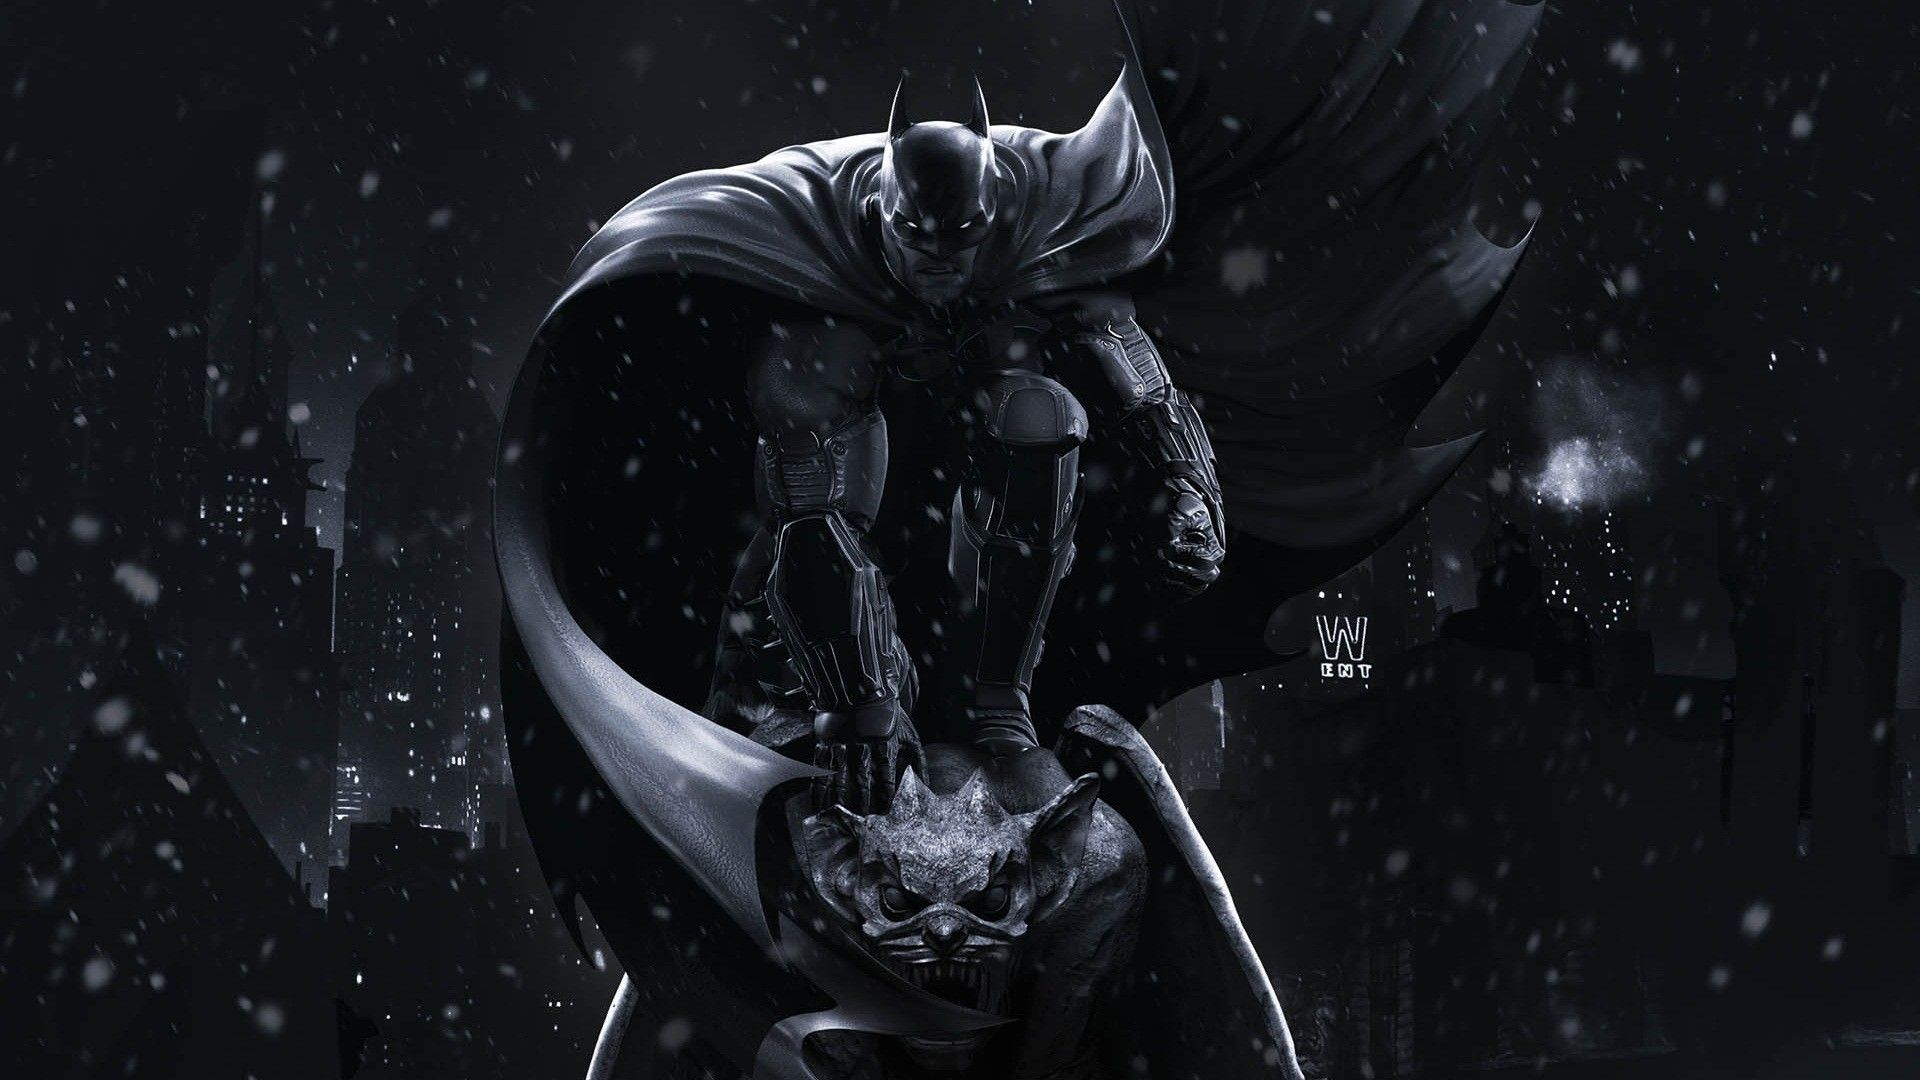 Batman The Dark Knight Artwork Gotham City Wallpaper 5648